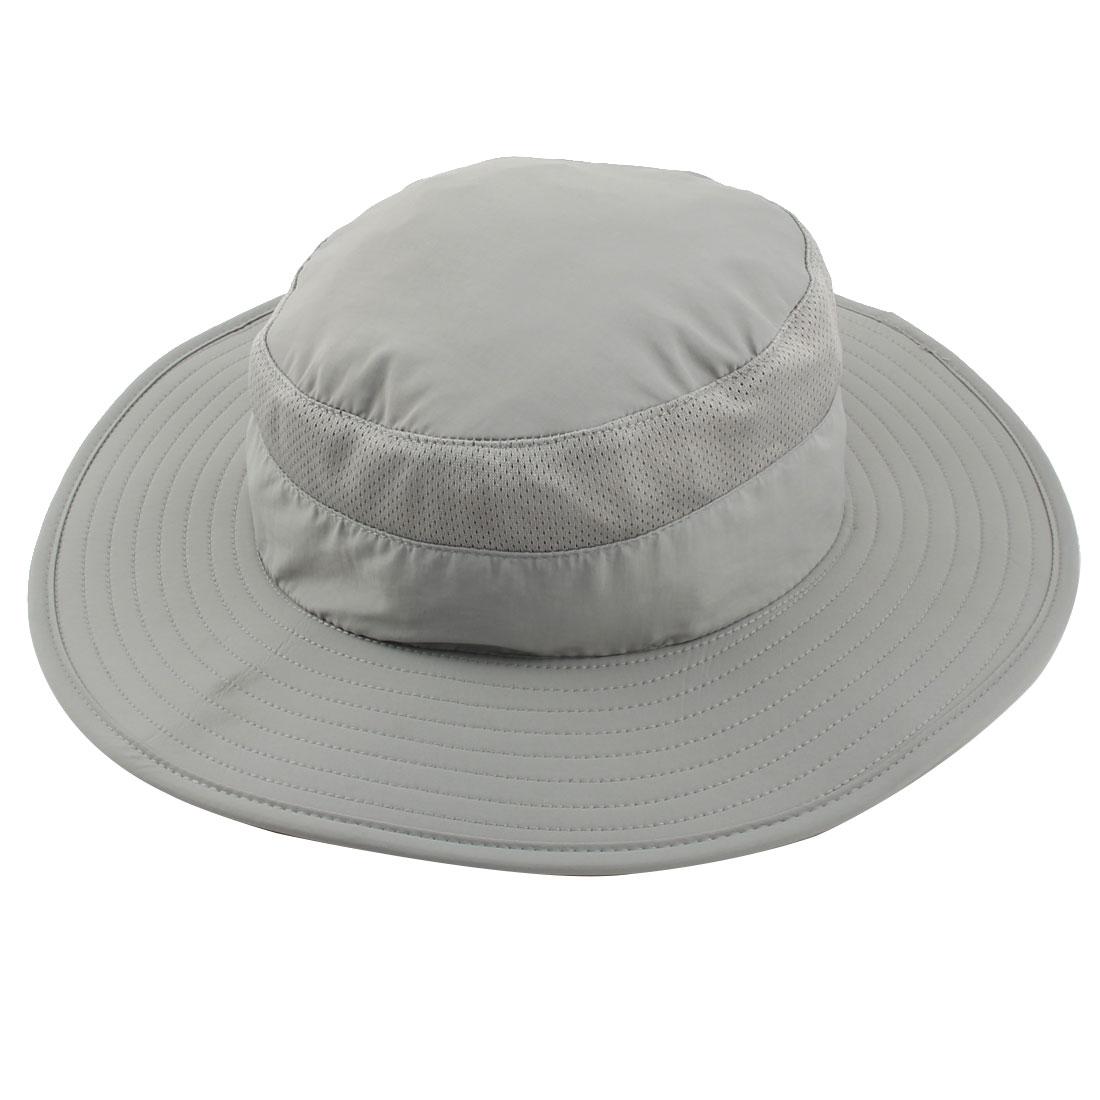 Fisherman Nylon Outdoor Sports Climbing Wide Brim Removable Neck Protector Cloth Bucket Summer Cap Fishing Hat Gray